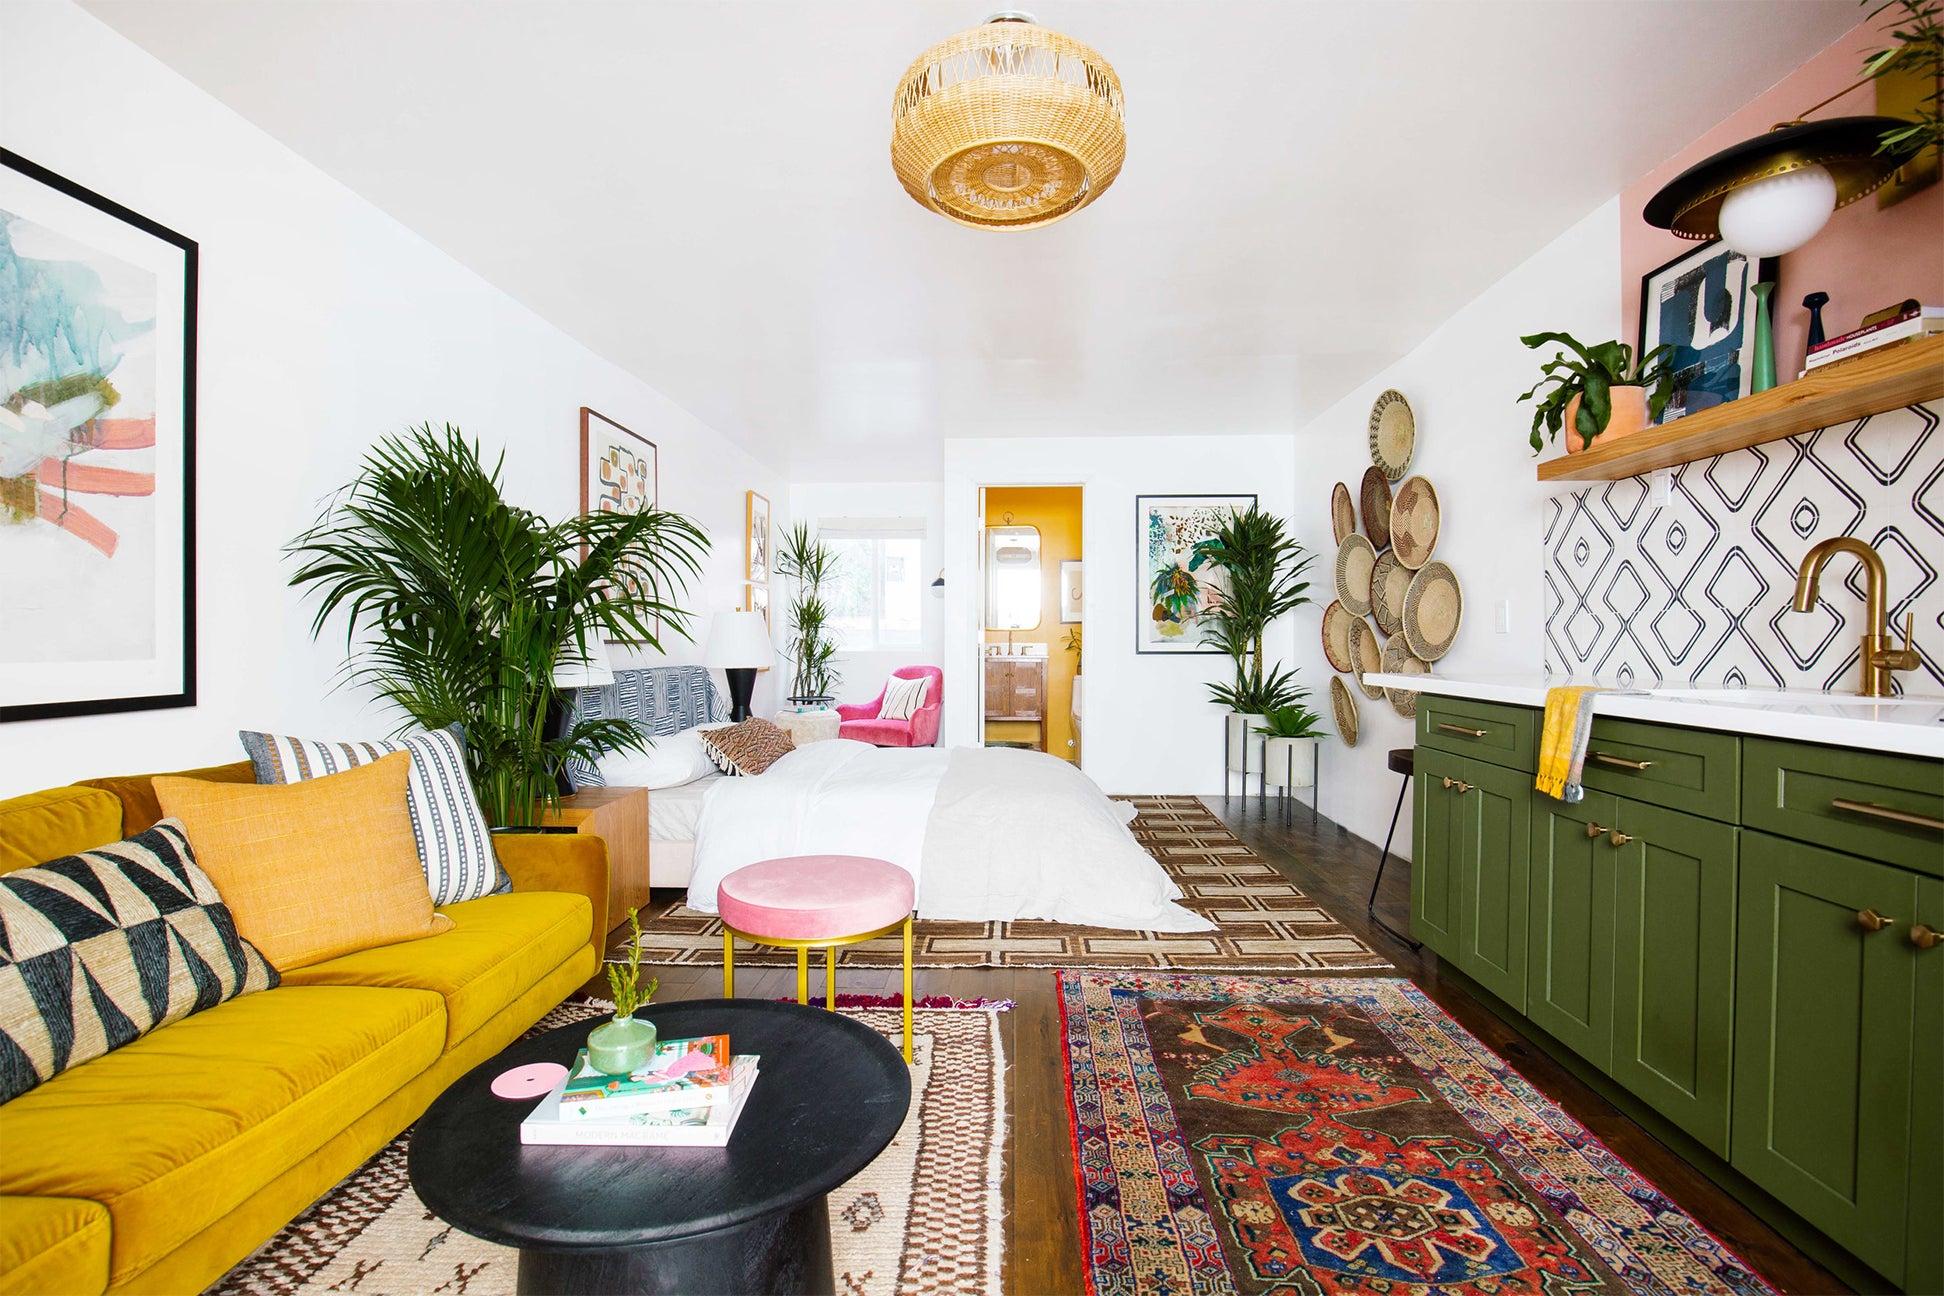 studio apartment with green kitchen